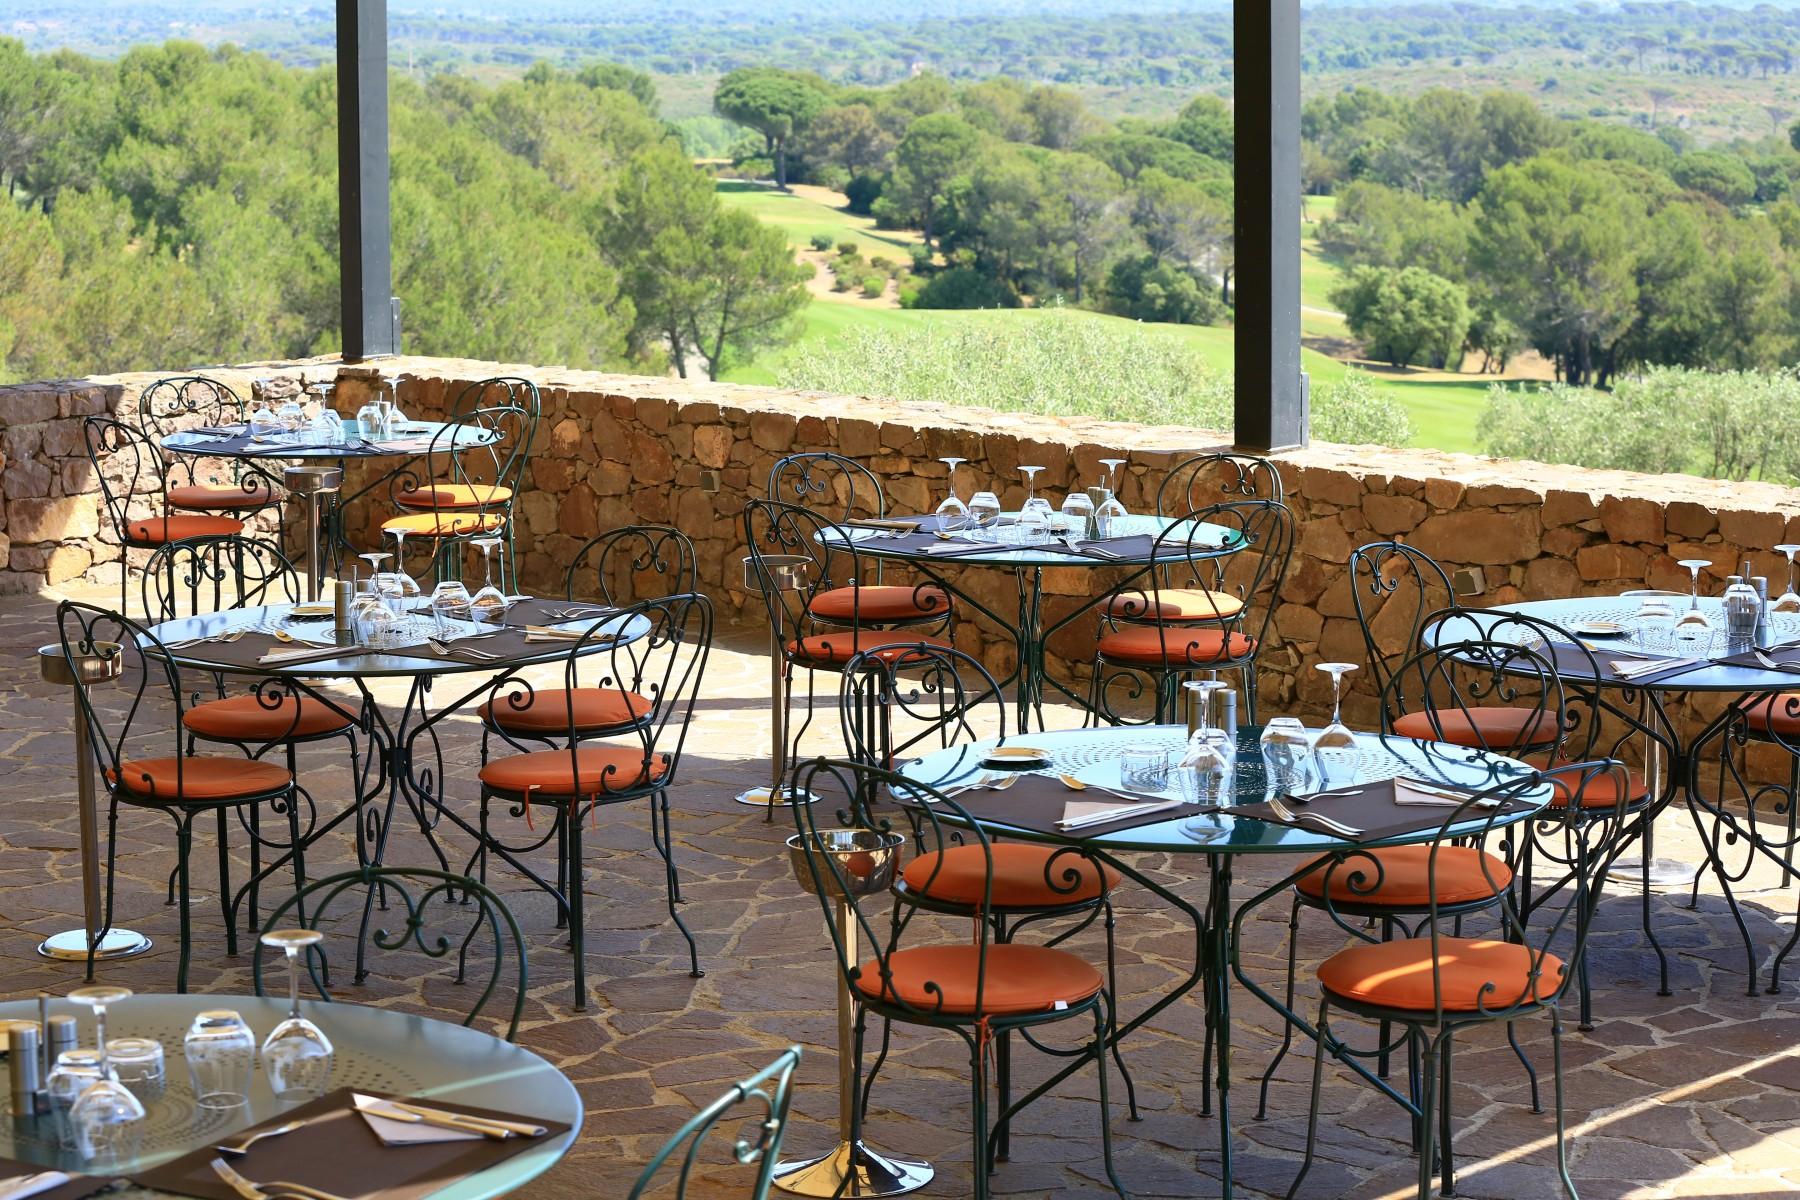 golf-expedition-golf-reizen-frankrijk-regio-cote-d'azur-Les-Domaines-de-Saint-Endréol-Golf-en-Spa-Resort-terras-restaurant